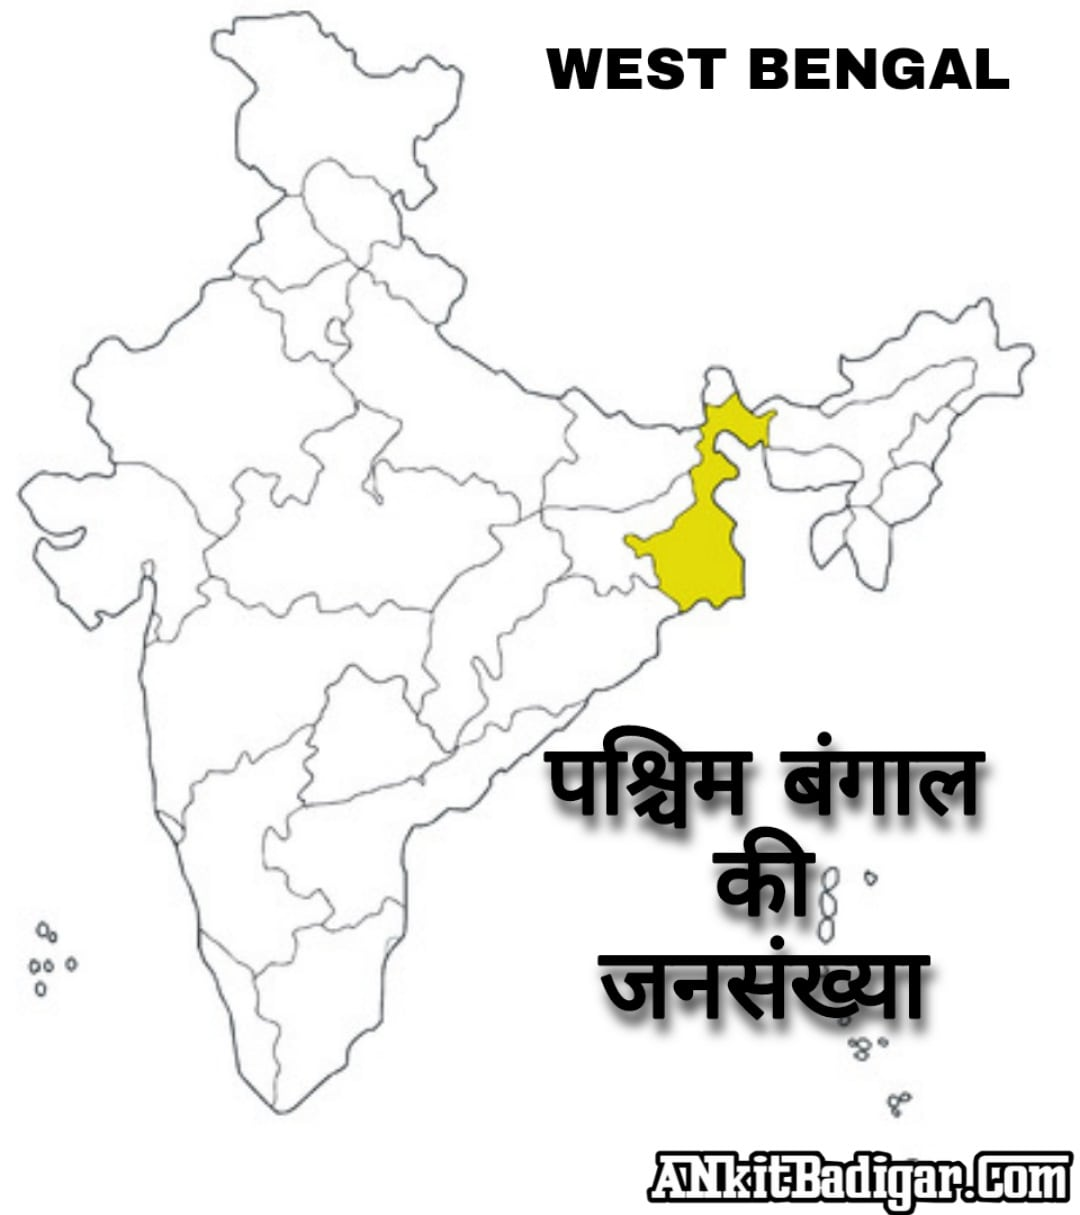 West Bengal Ki Jansankhya